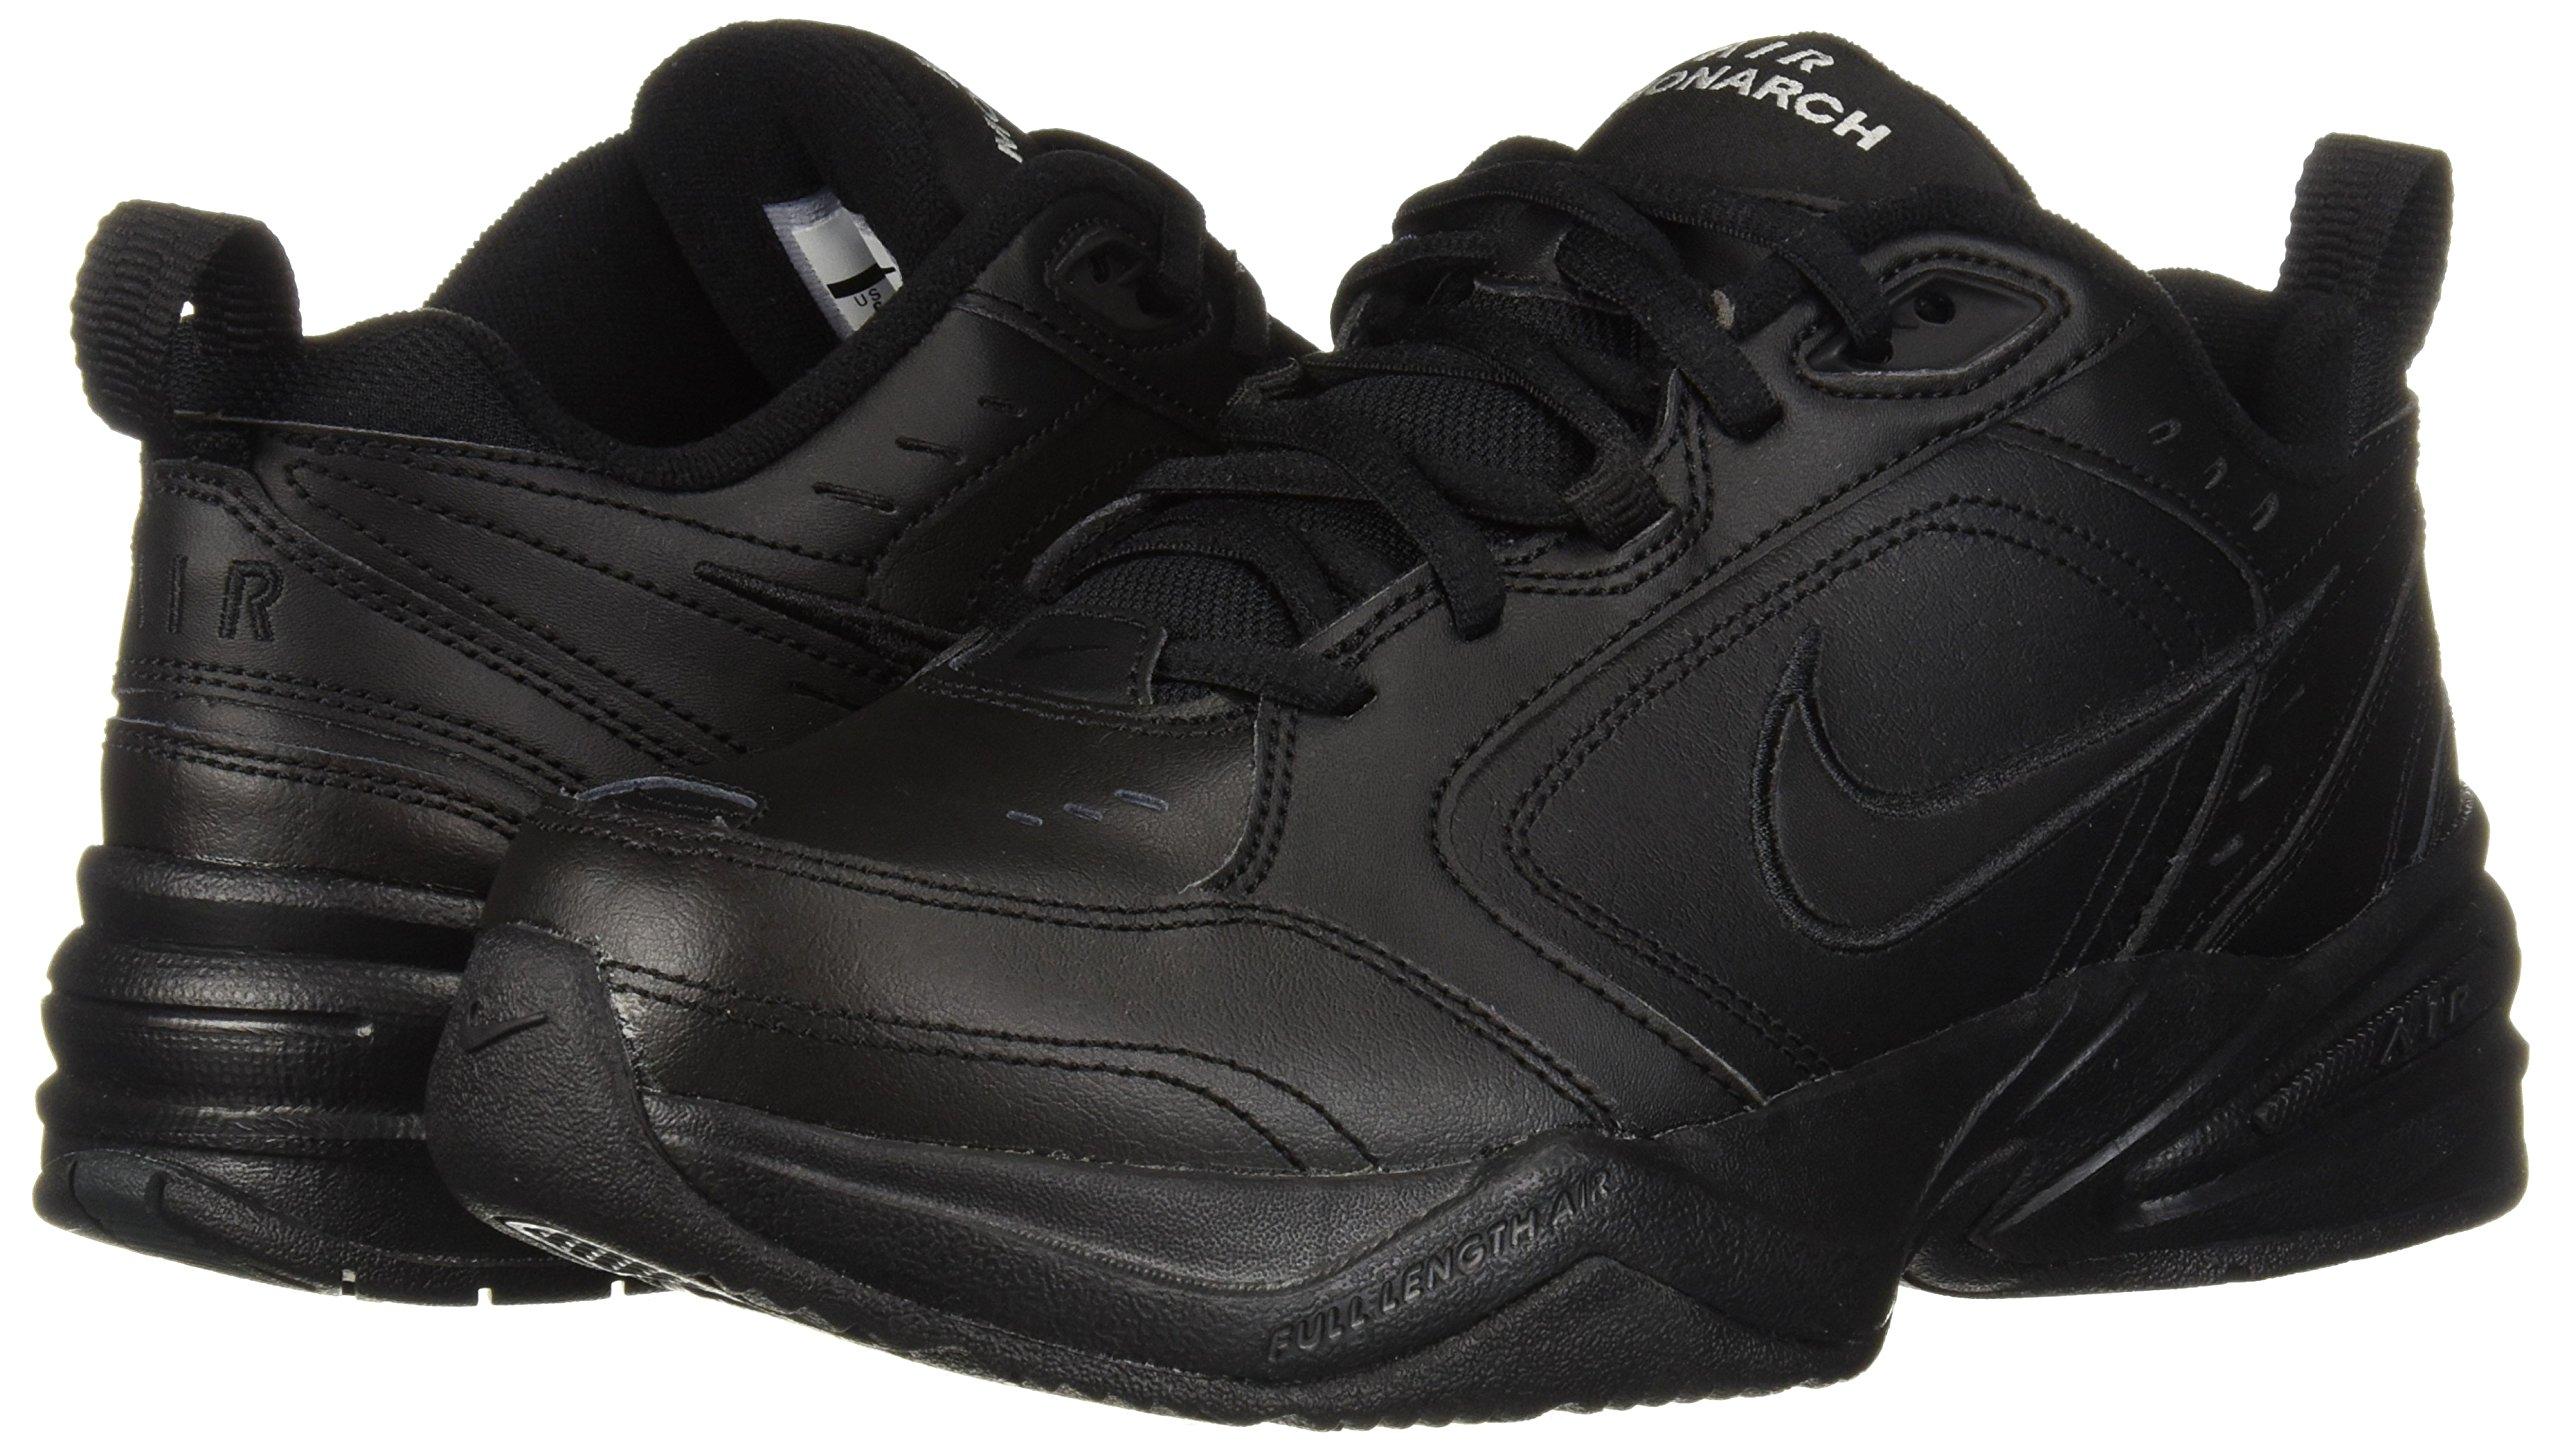 Nike-Men-039-s-Air-Monarch-IV-Cross-Trainer-Sneaker-416355 thumbnail 8